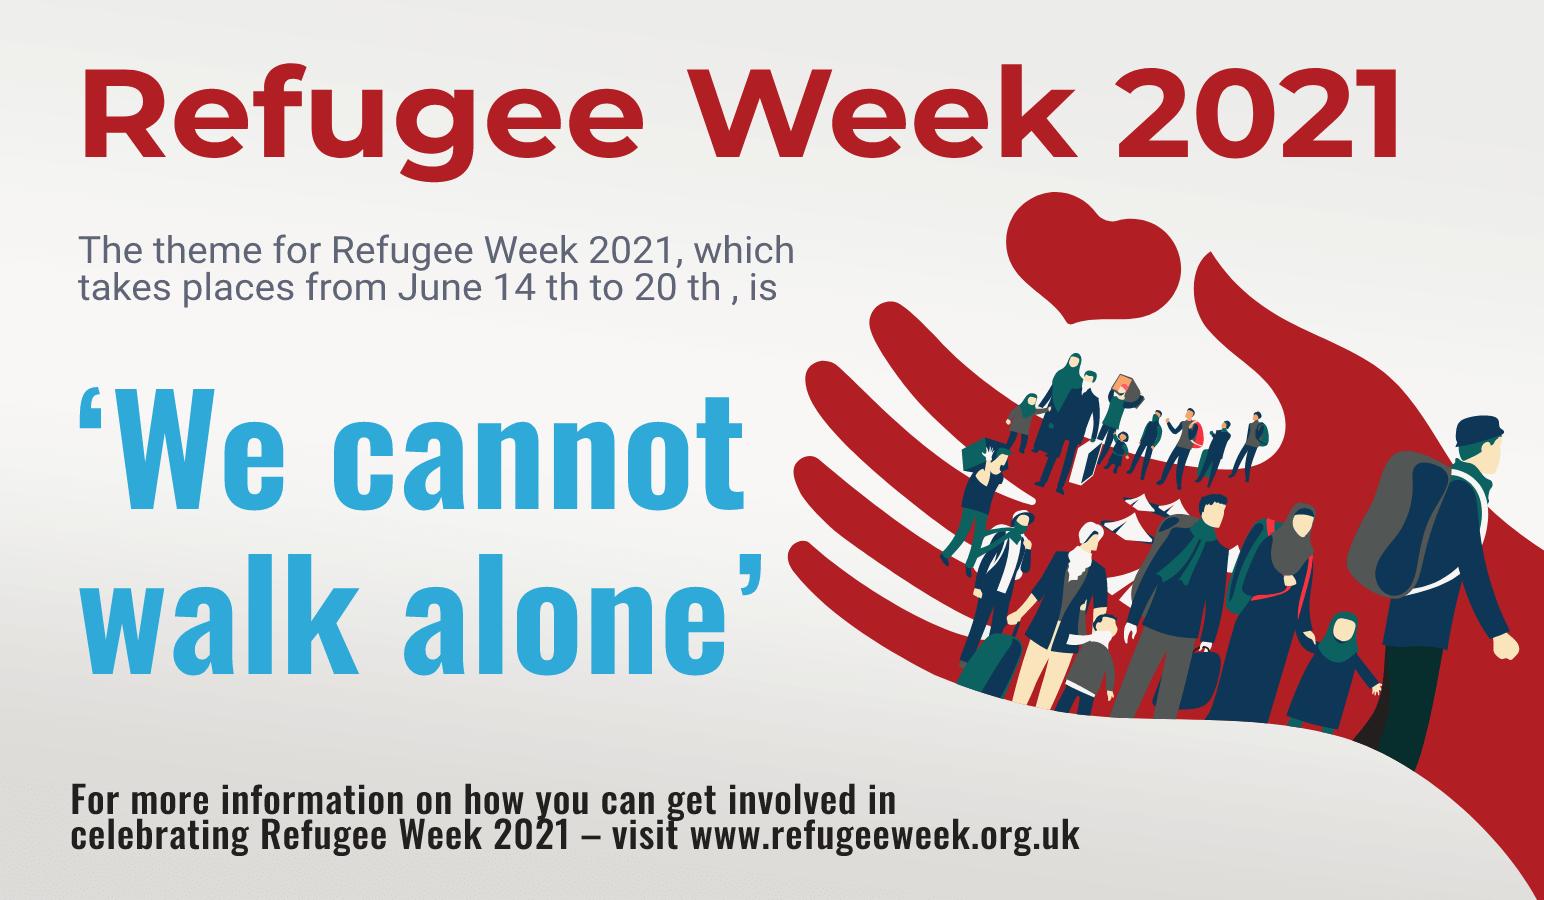 Refugee Week 2021 race council cymru